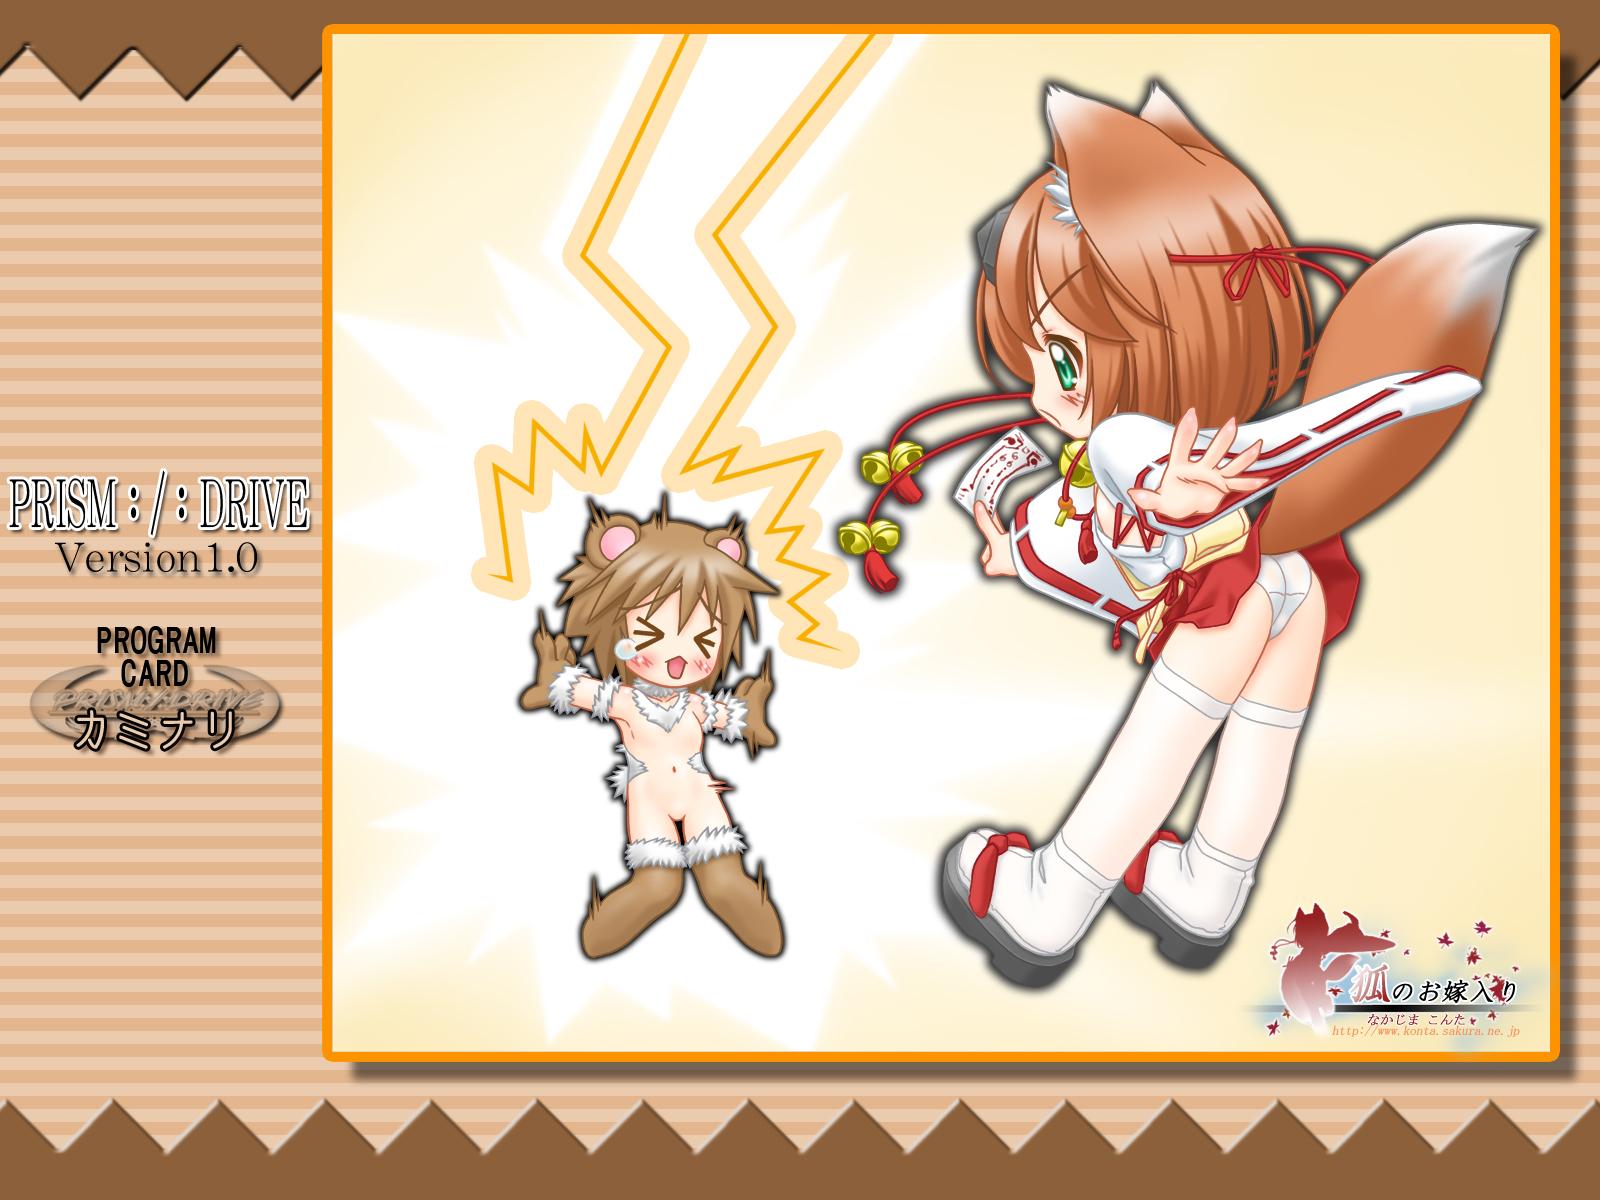 p-kaminari1600x1200.jpg